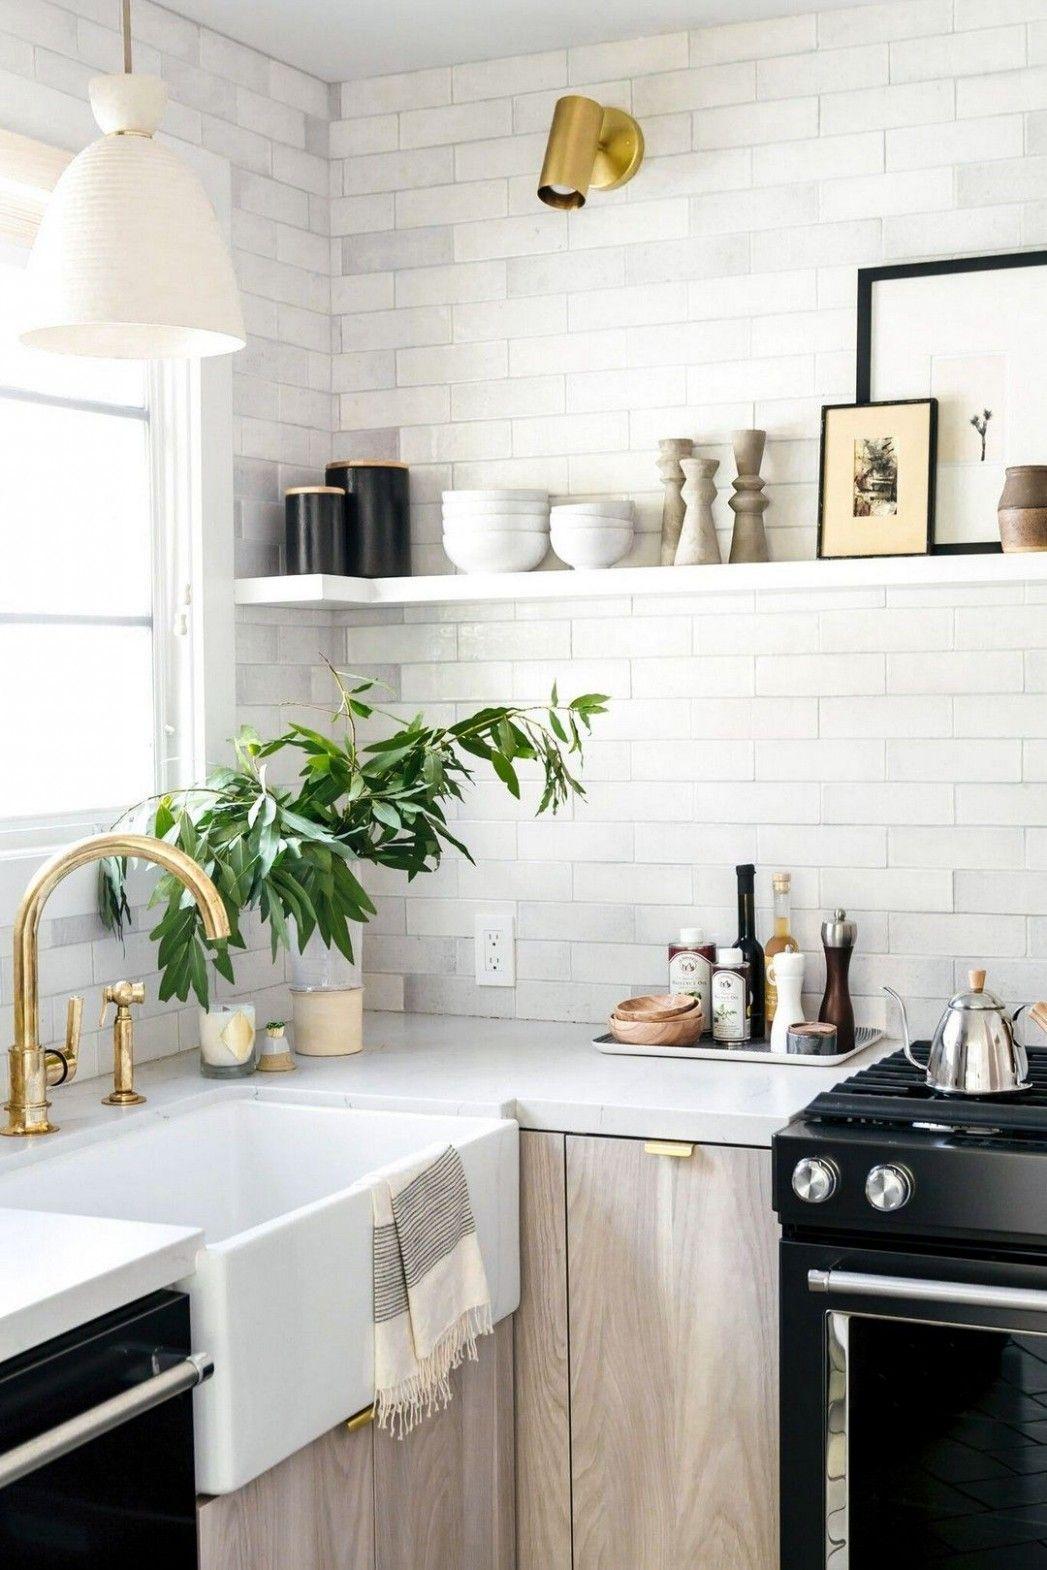 Pinterest Kitchen Remodel In 2020 Kitchen Remodel Small Kitchen